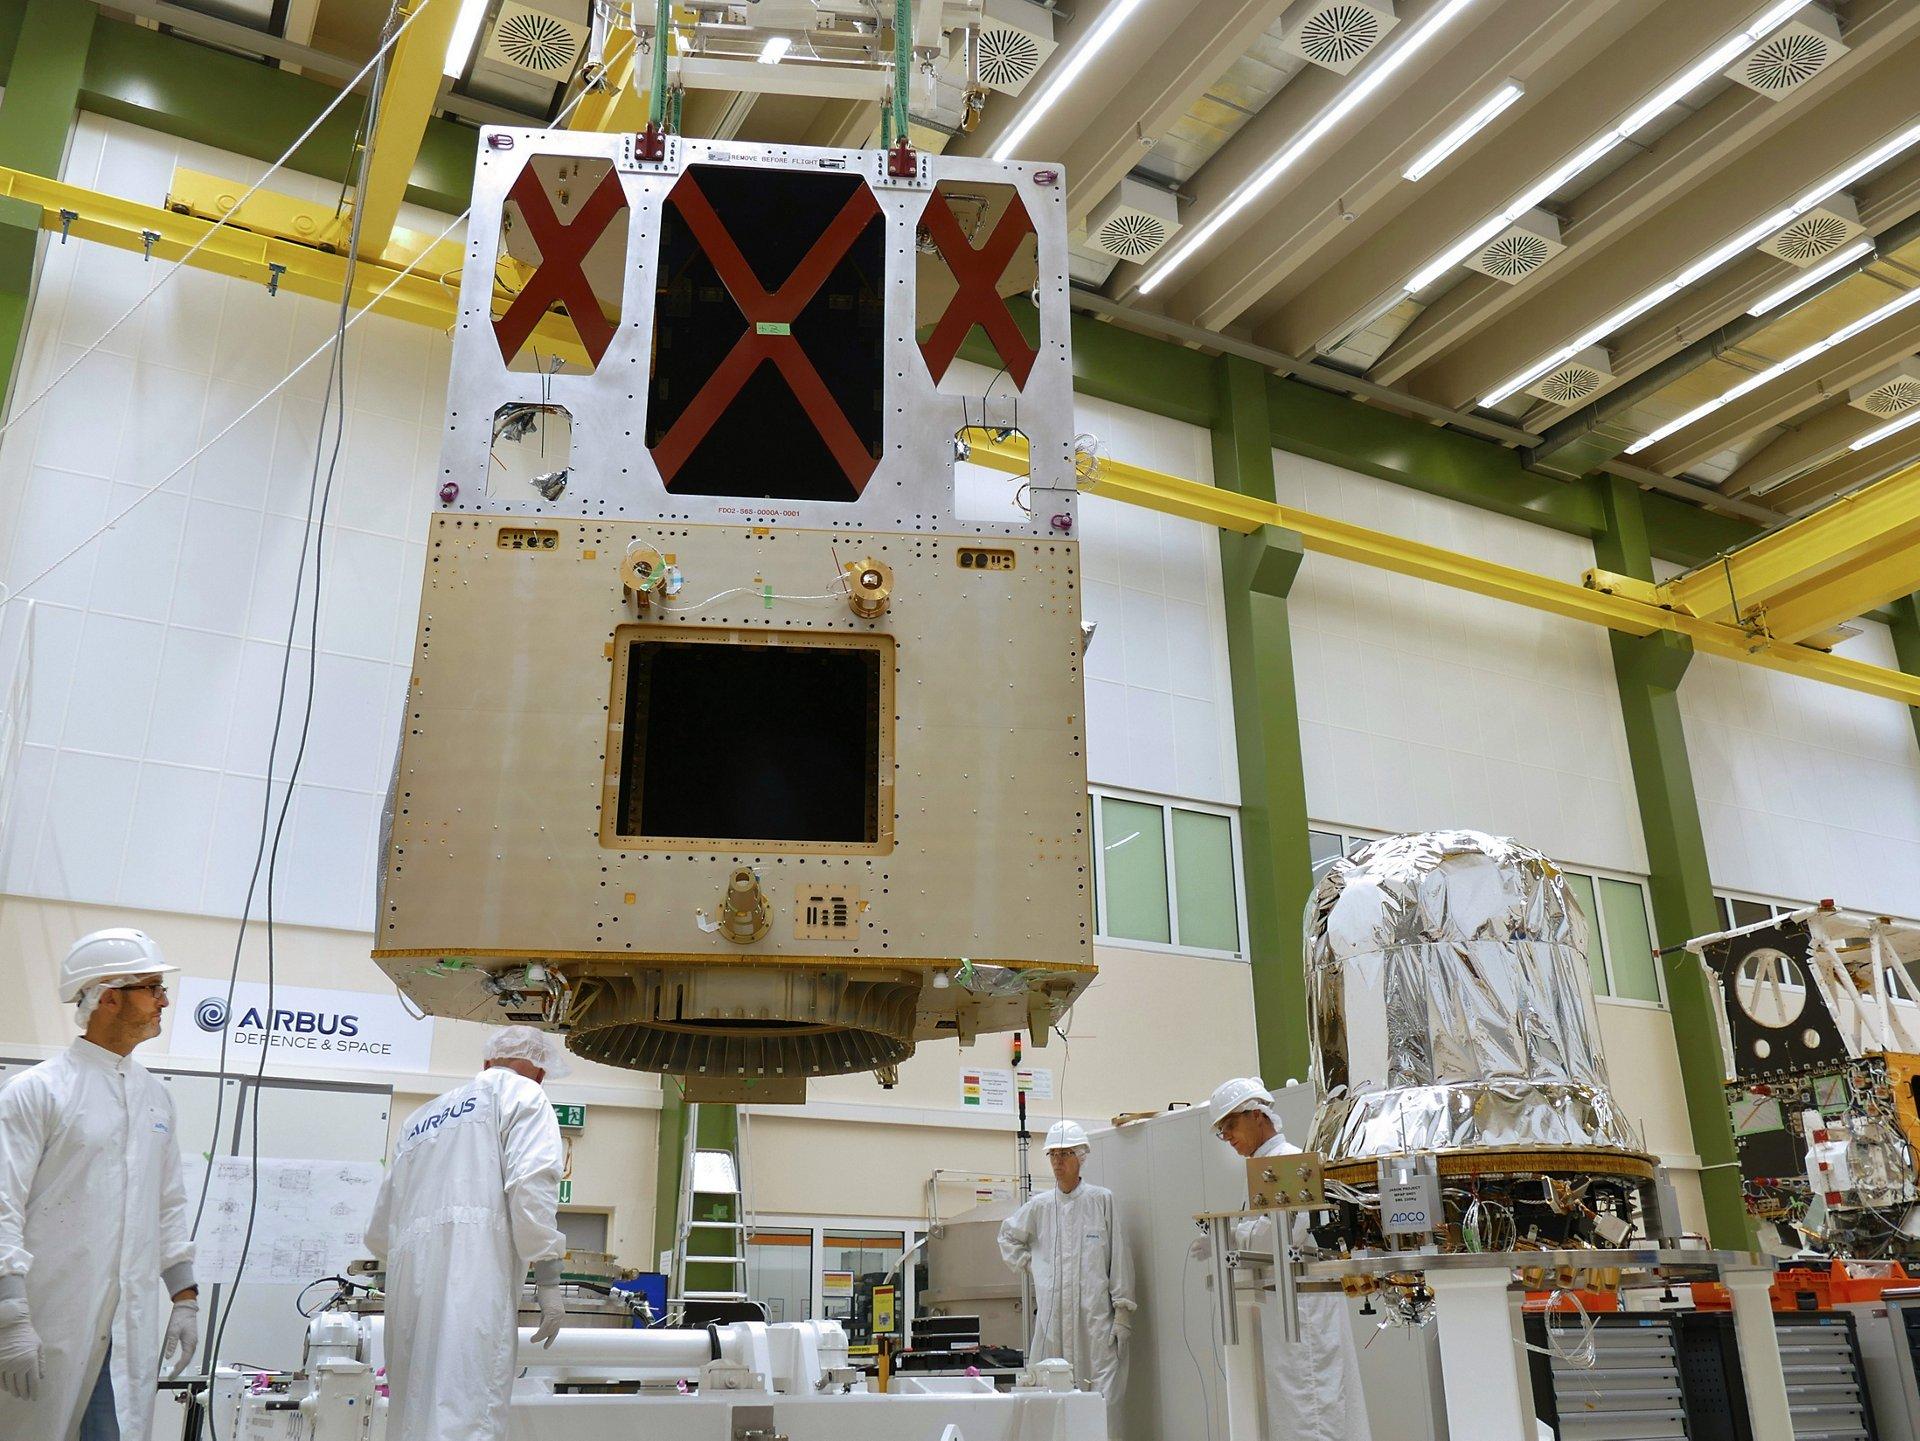 Sentinel-6: Integration of Propulsion Module. Copyright Airbus 2018